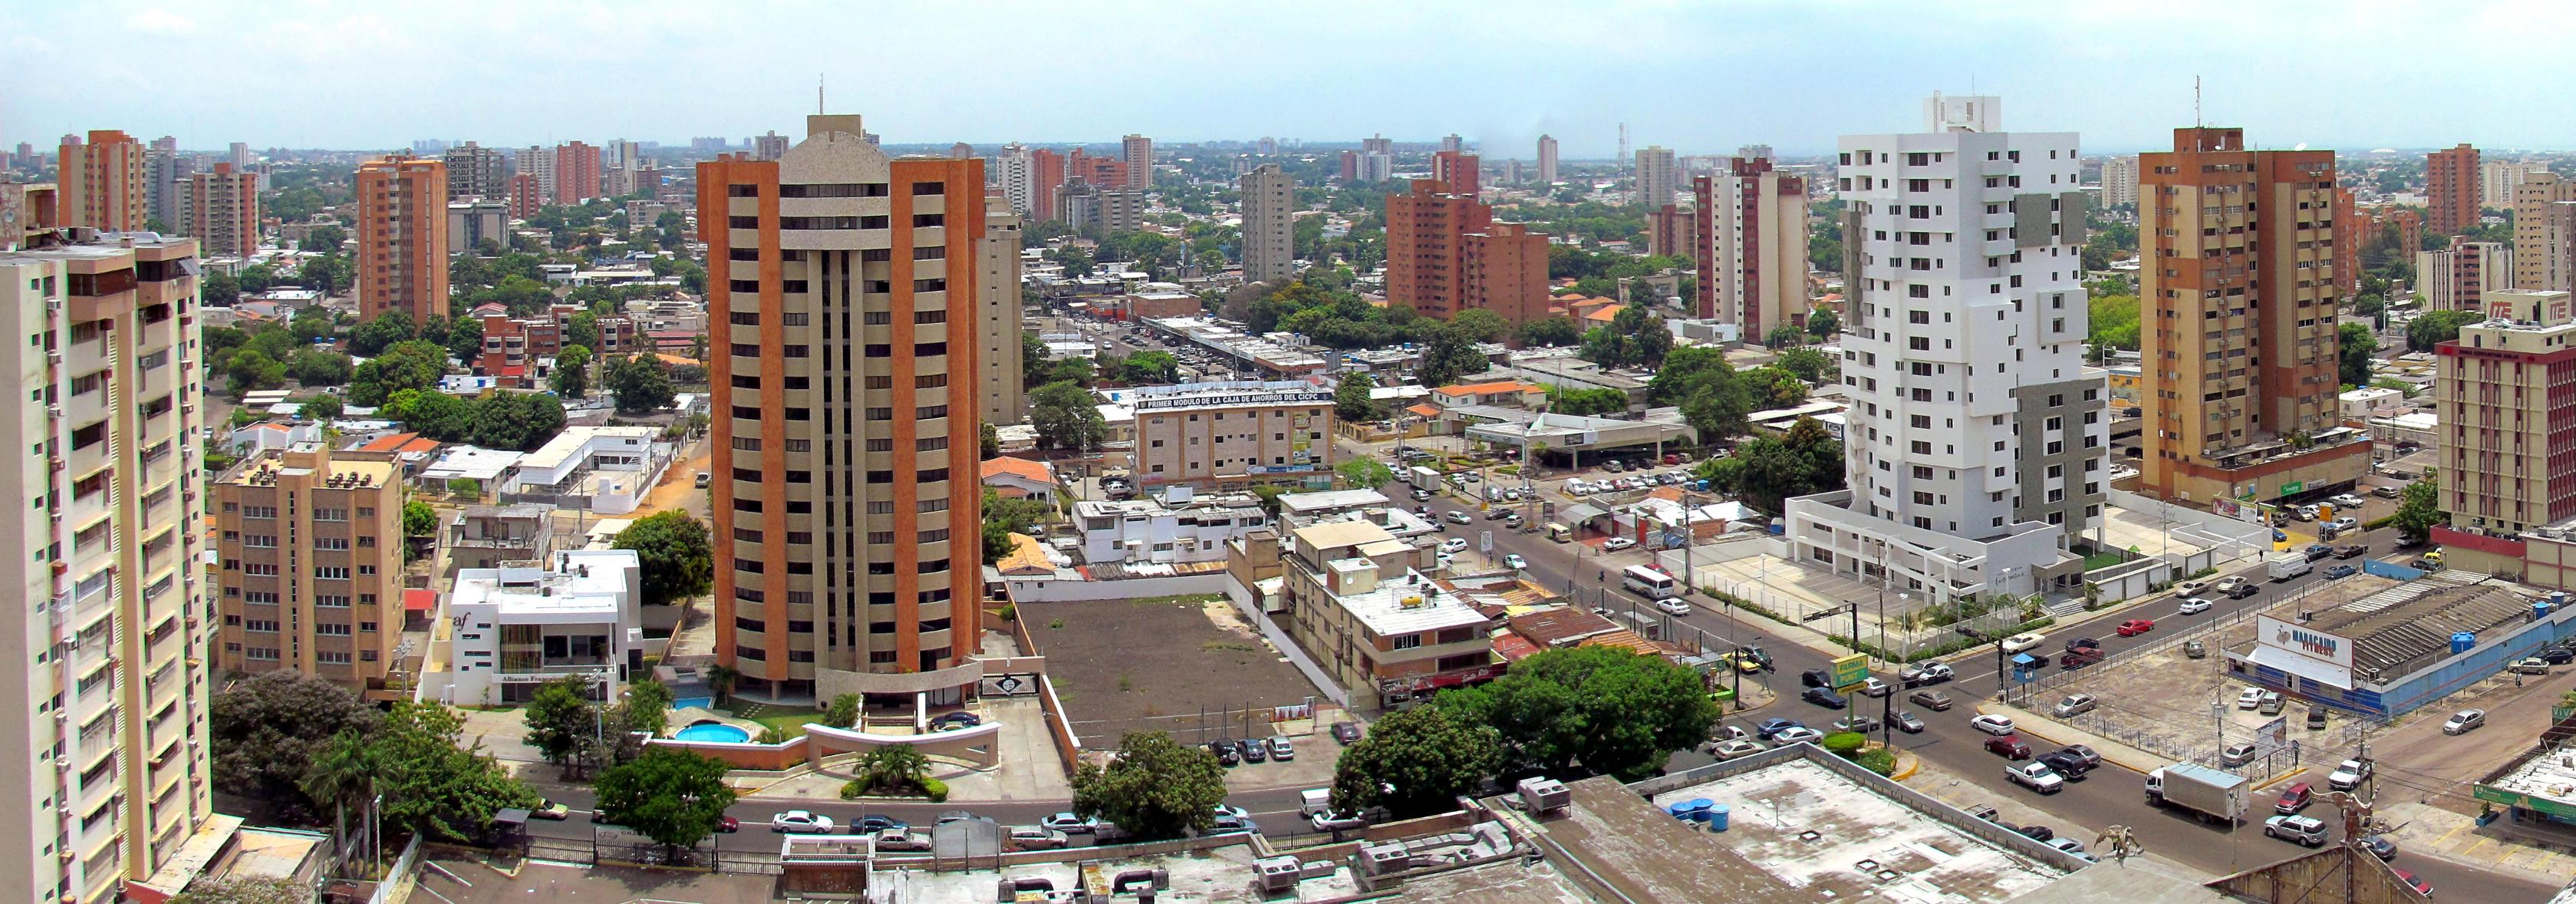 Depiction of Maracaibo